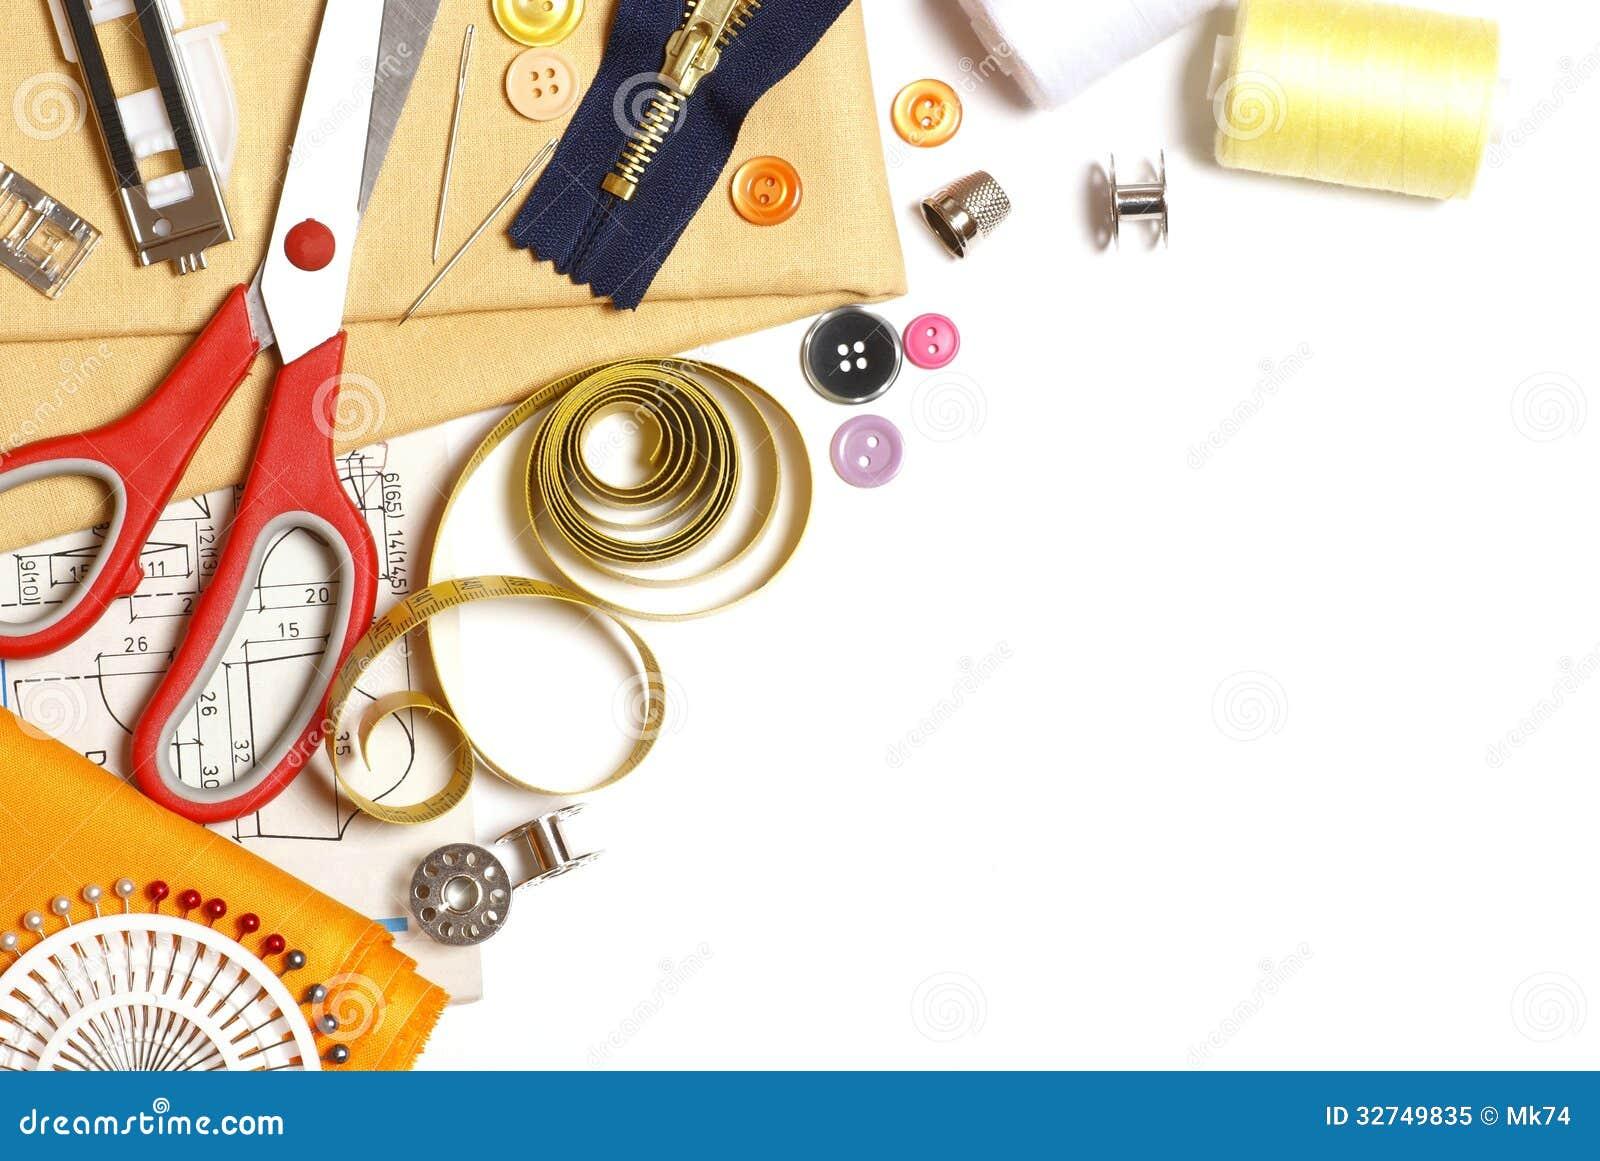 Sewing Background Royalty Free Stock Photo Image 32749835